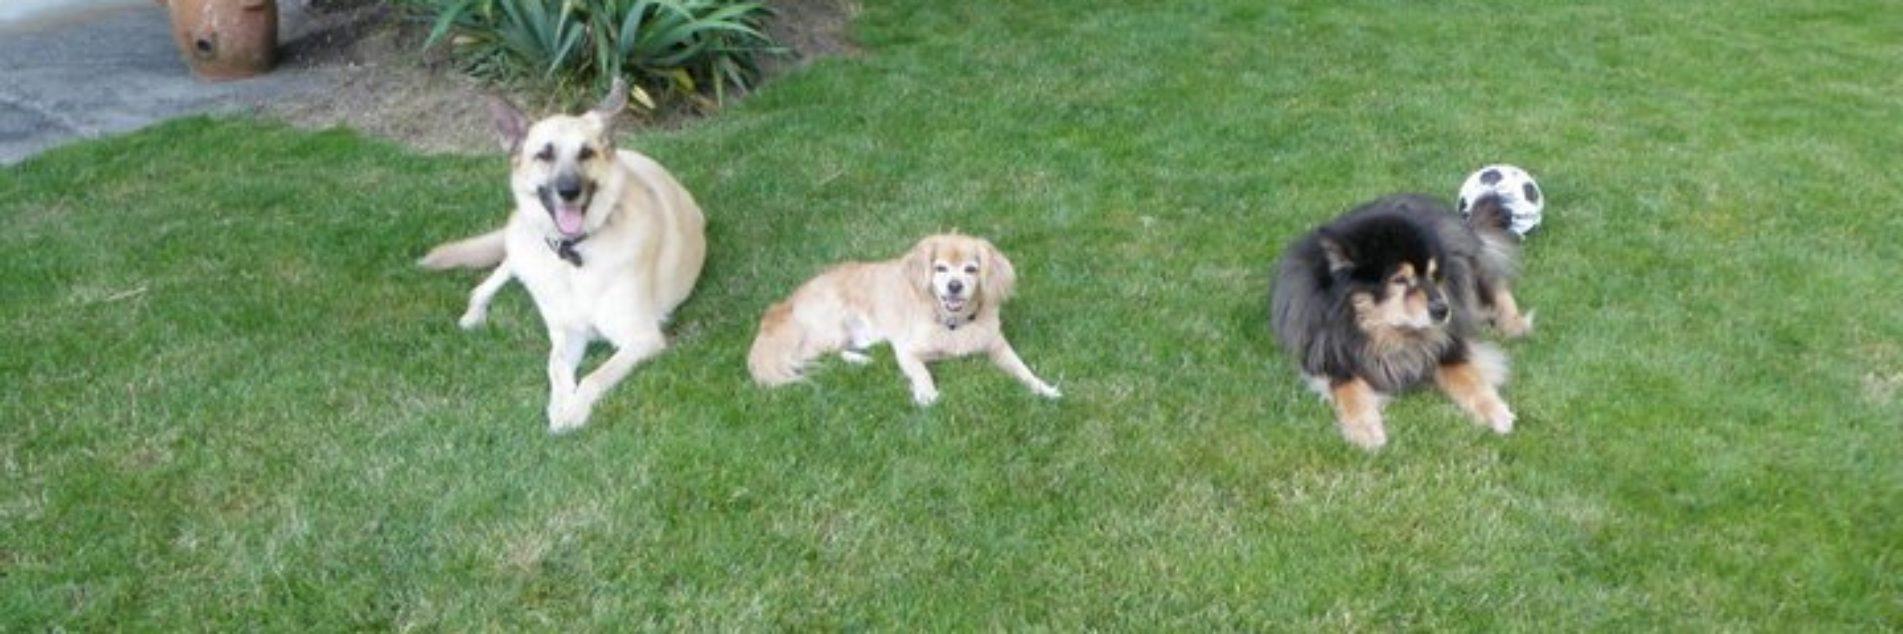 PAALS4Life Dog Training - Chilliwack, BC